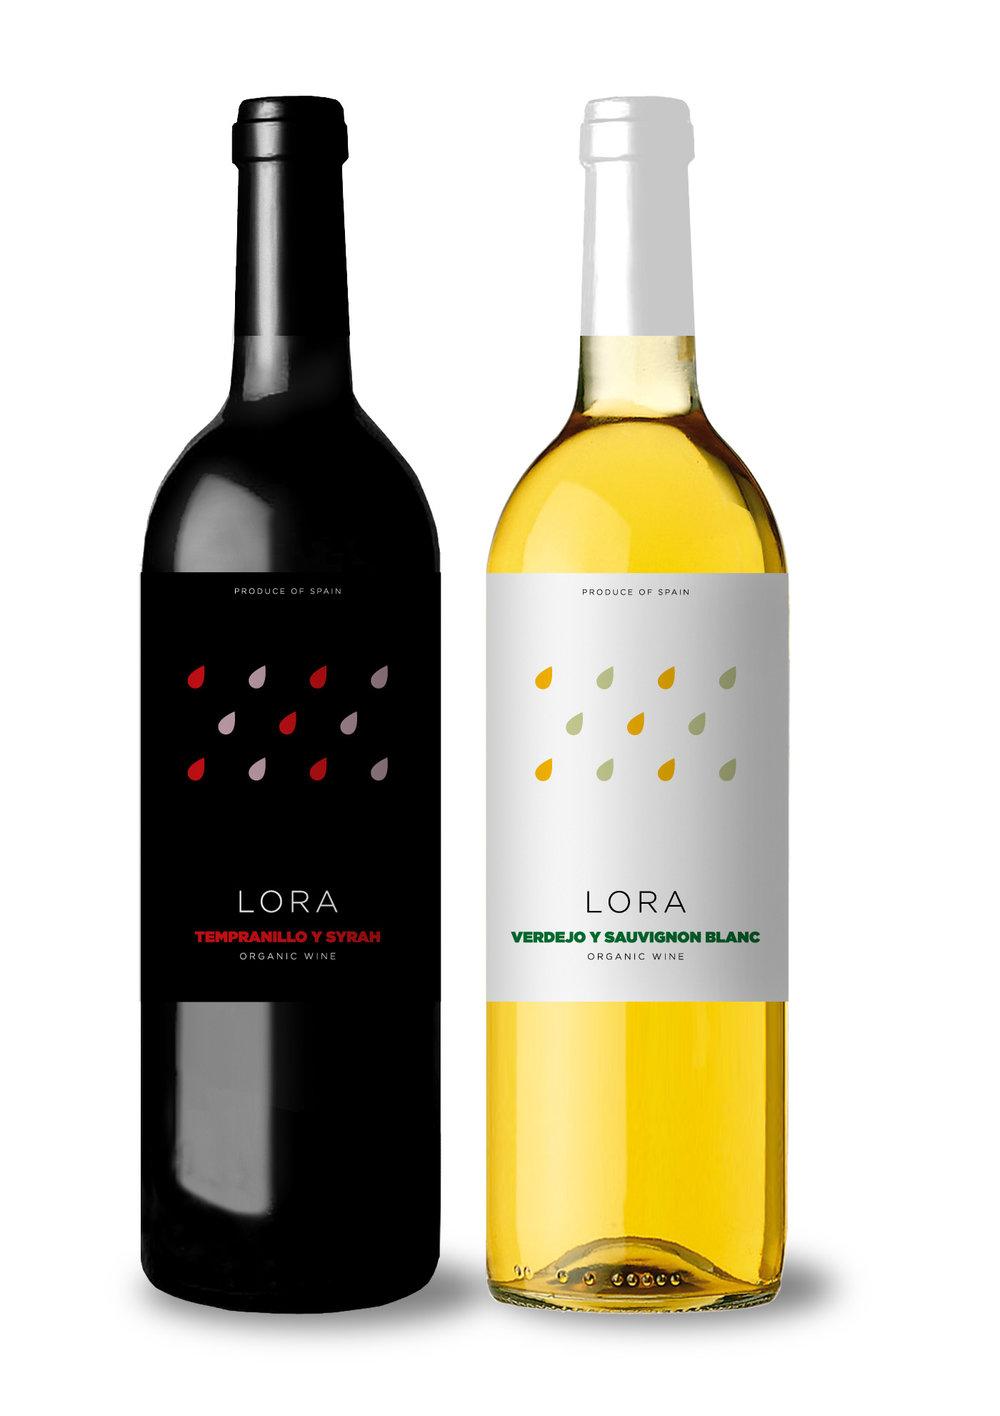 IRJIMPA photo lora wines.jpg